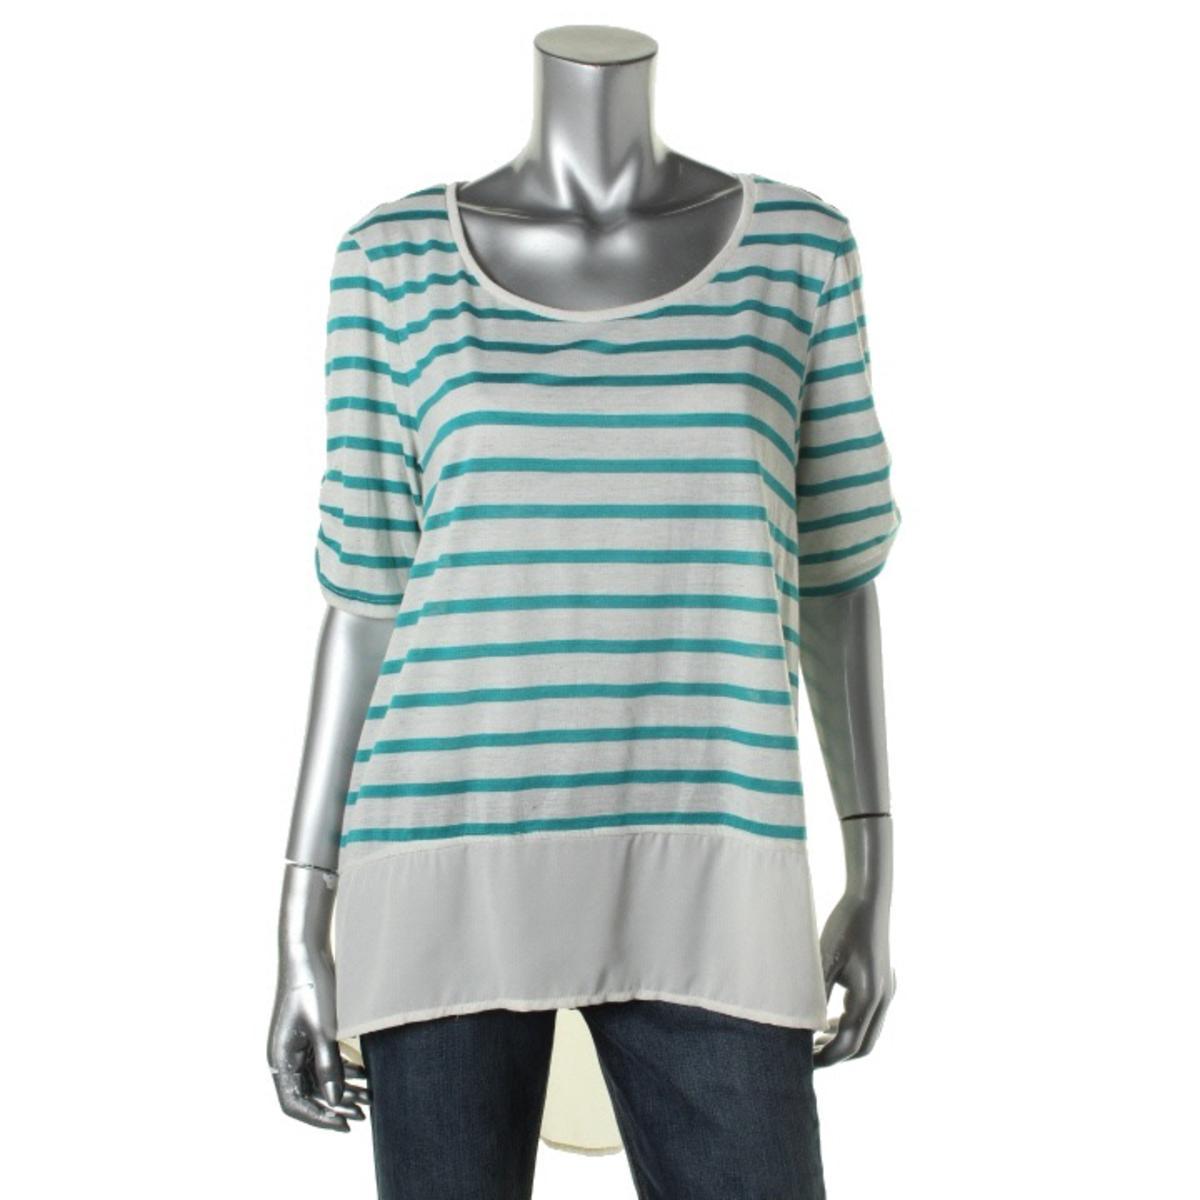 Style & Co. Linen Blend Chiffon Trim Tunic Top